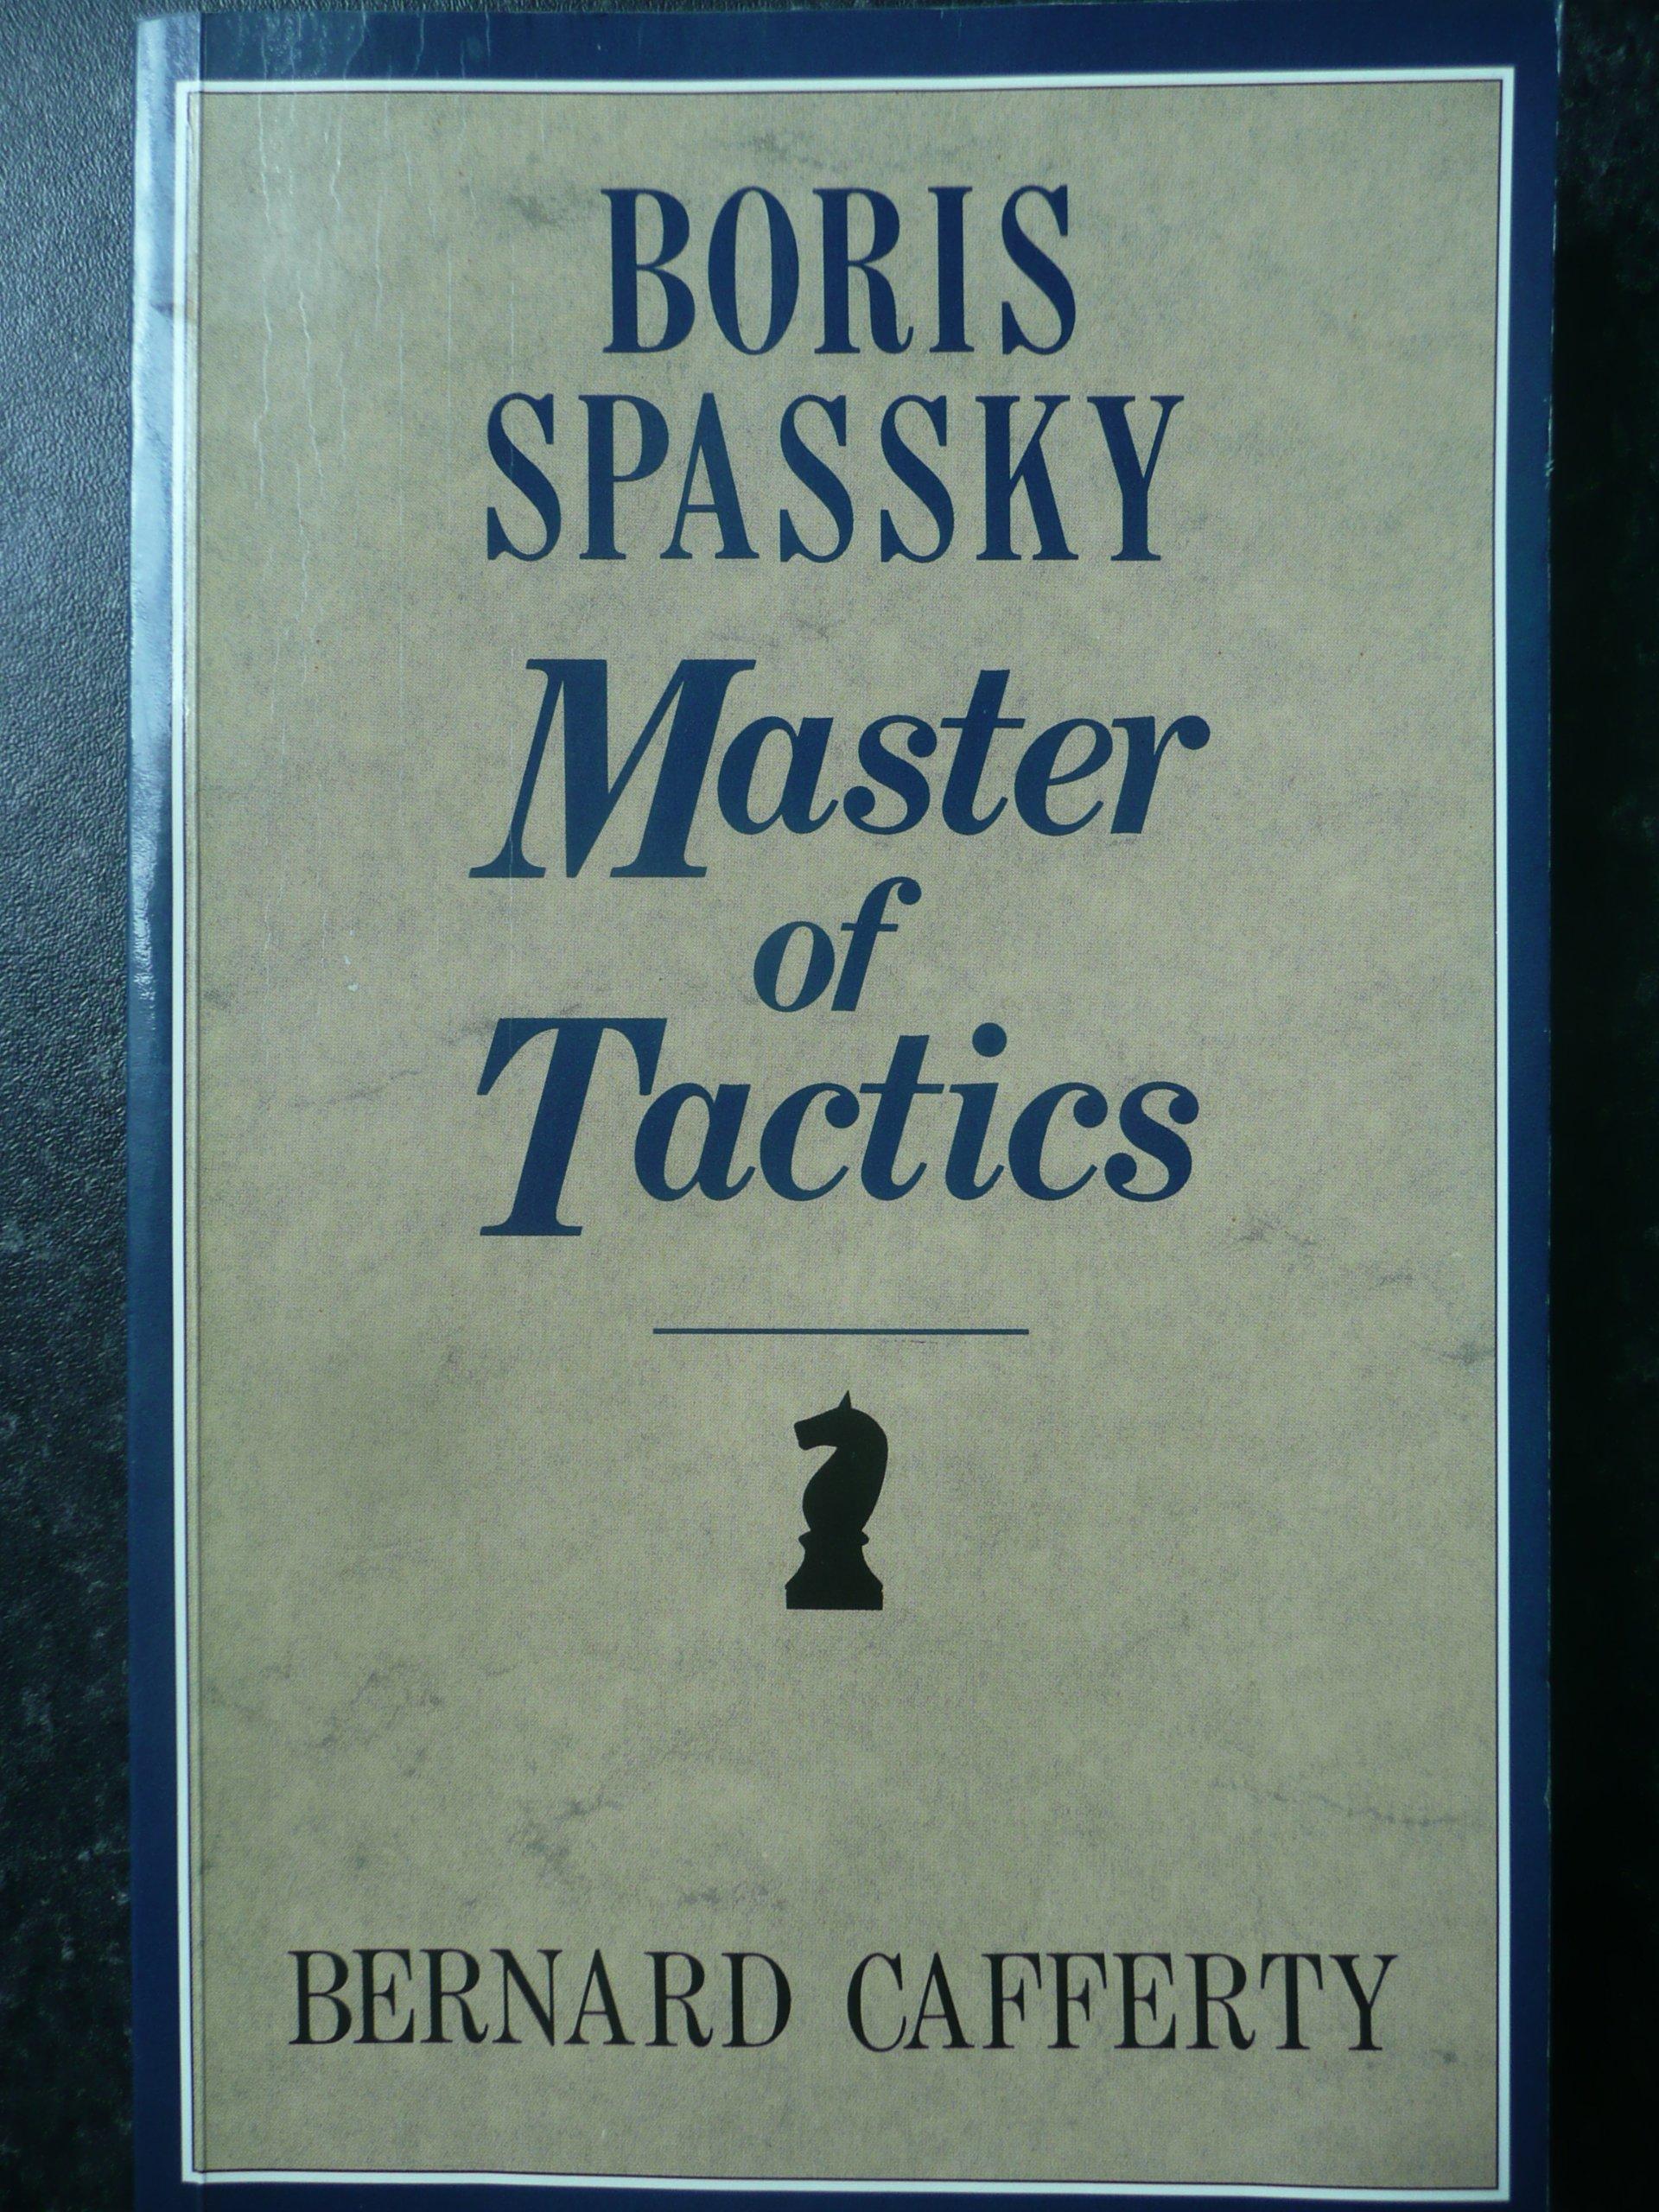 Boris Spassky, Master of Tactics (Batsford Art & Craft Books)